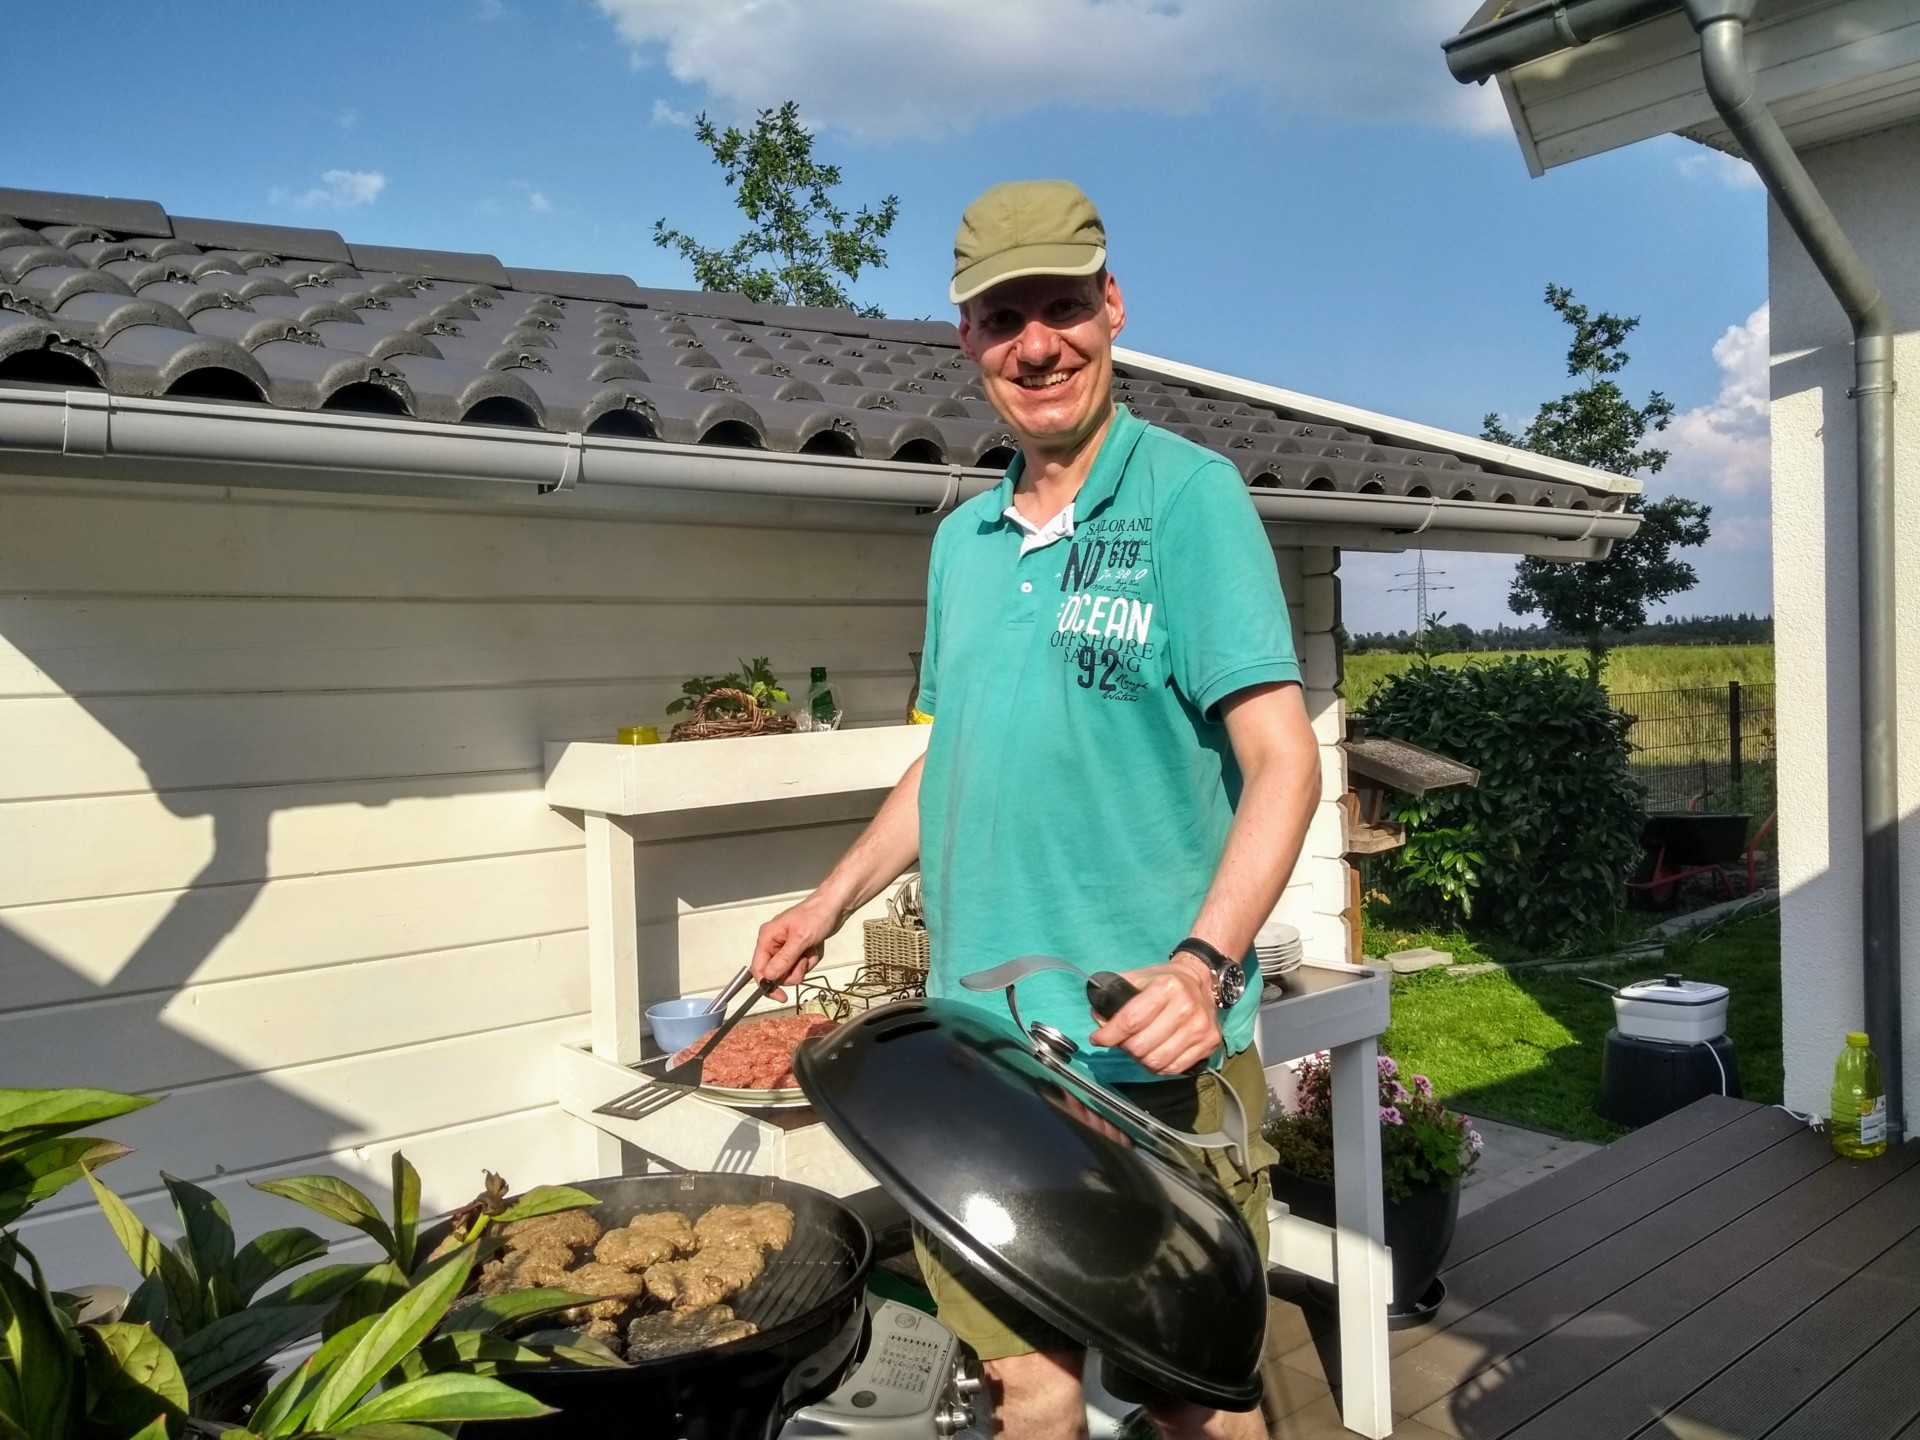 Familientag Wathlingen 30.08.2019